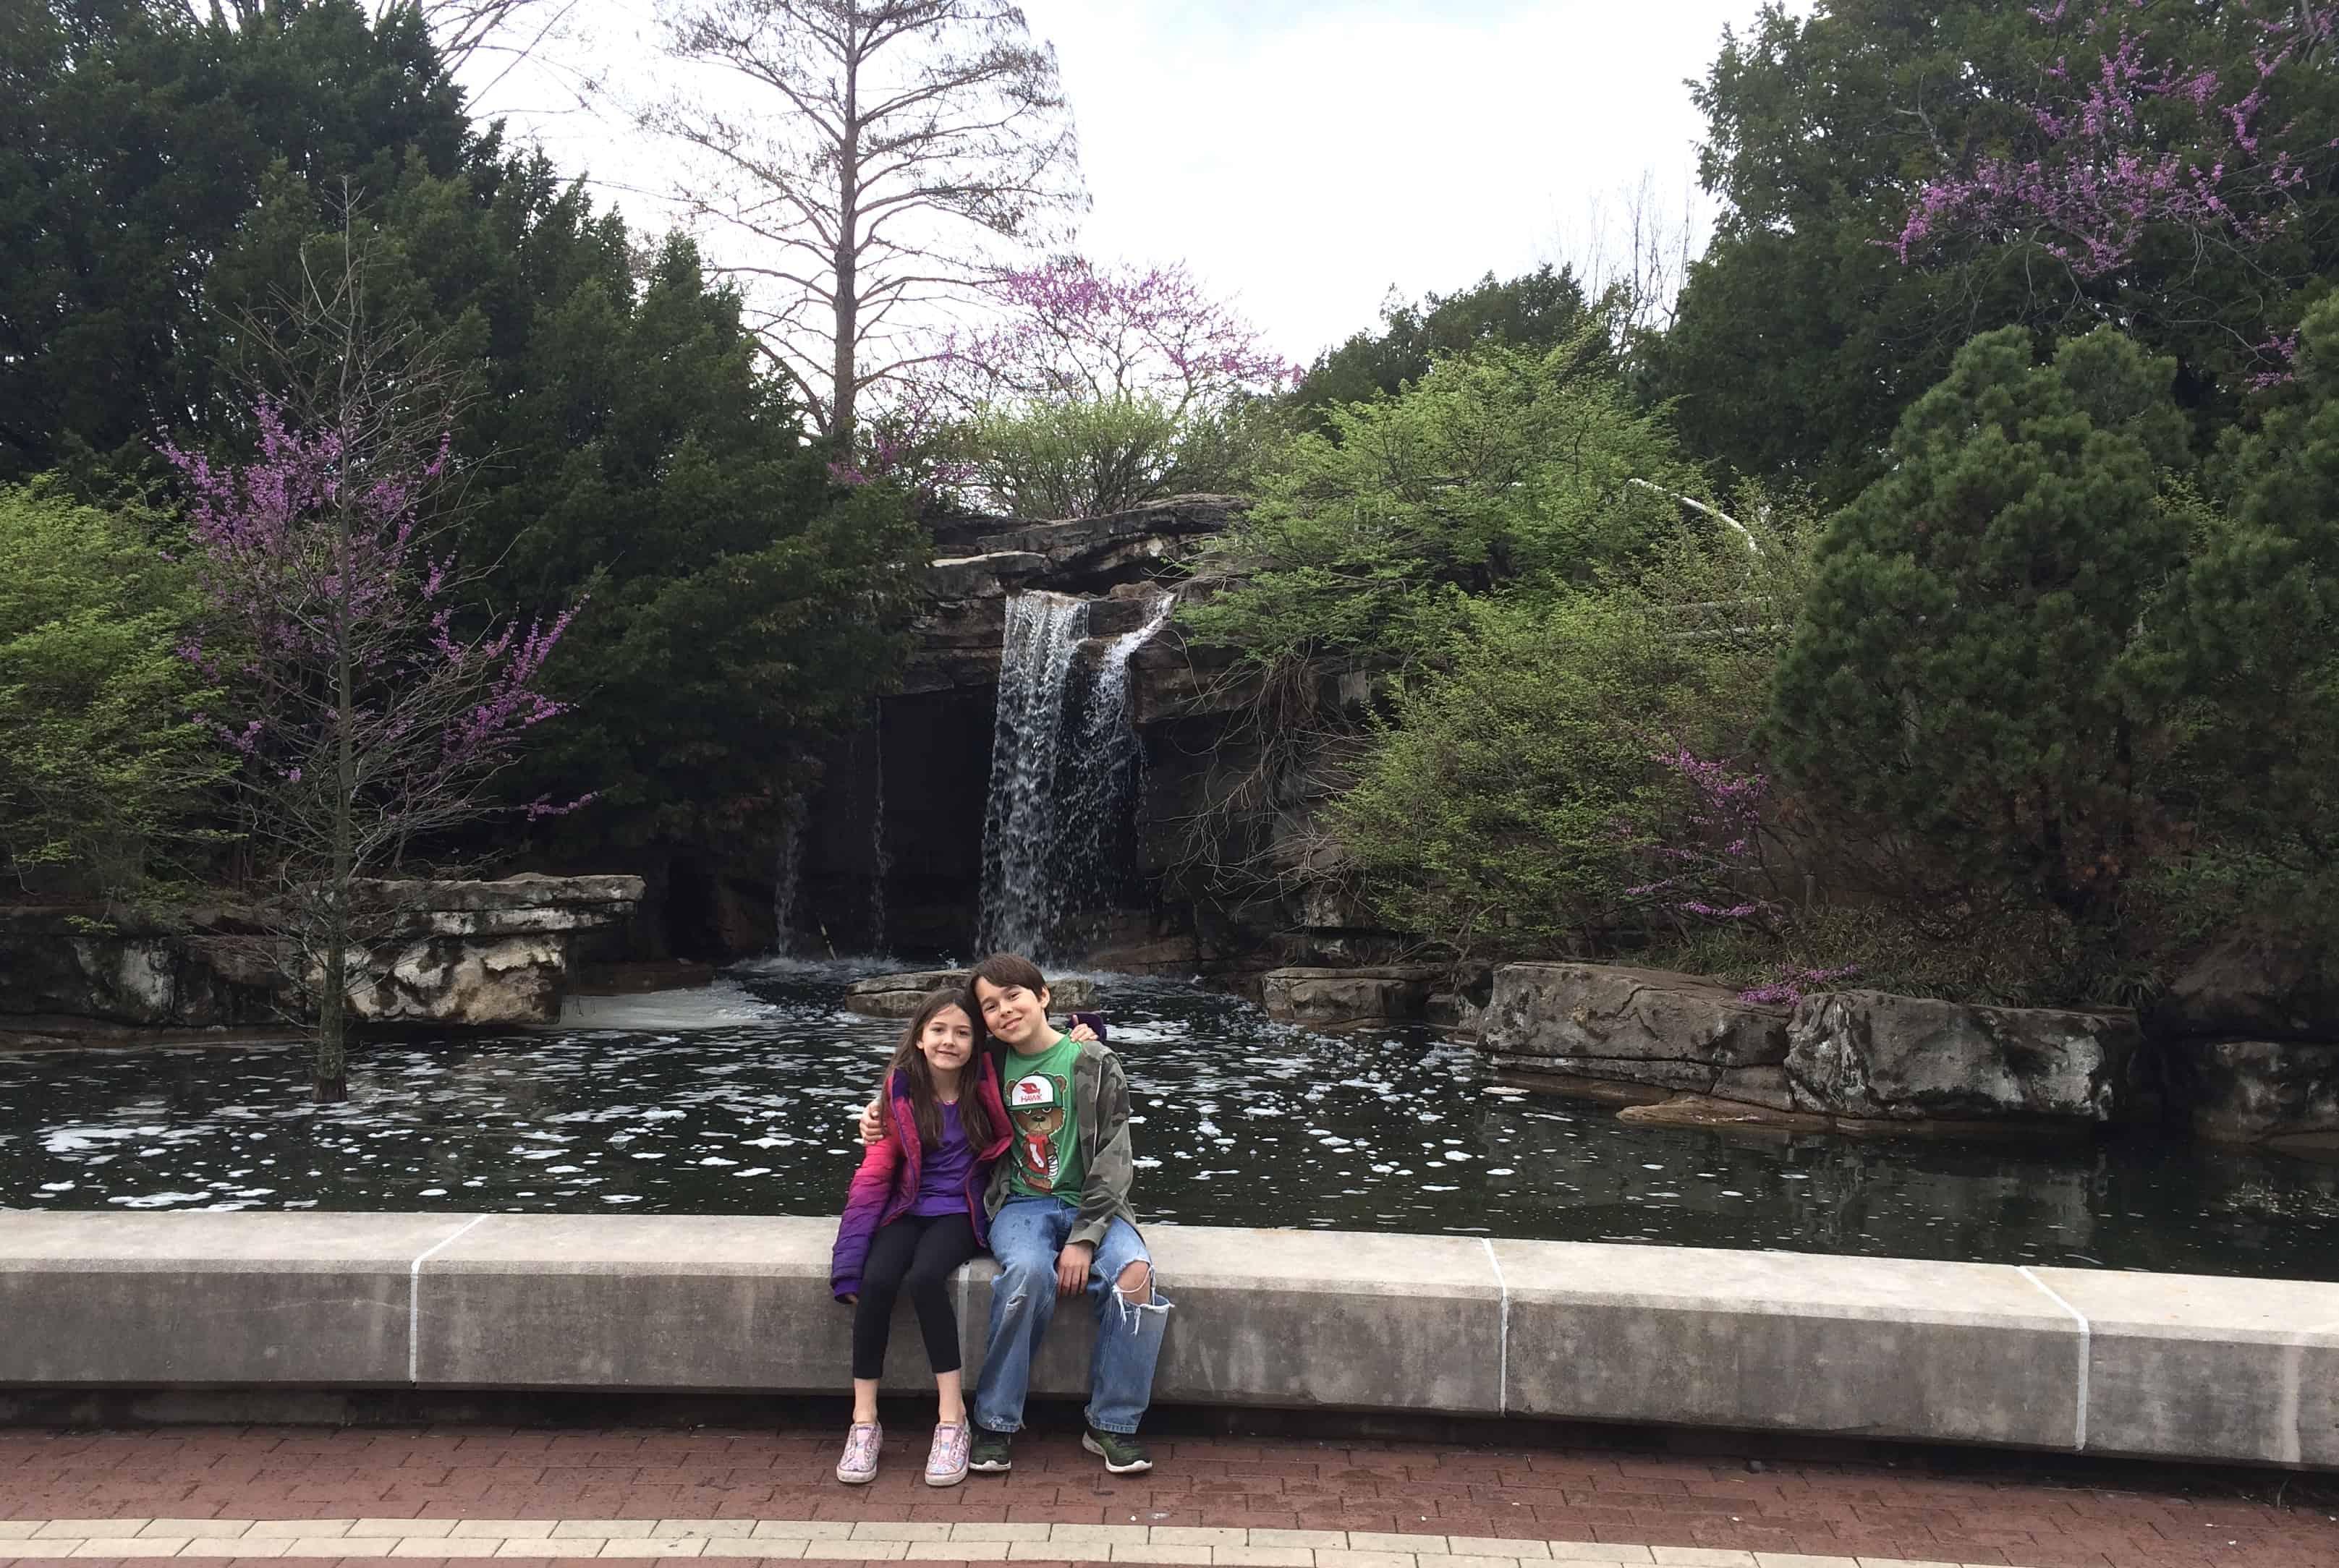 Saint Louis Zoo, family fun in Saint Louis